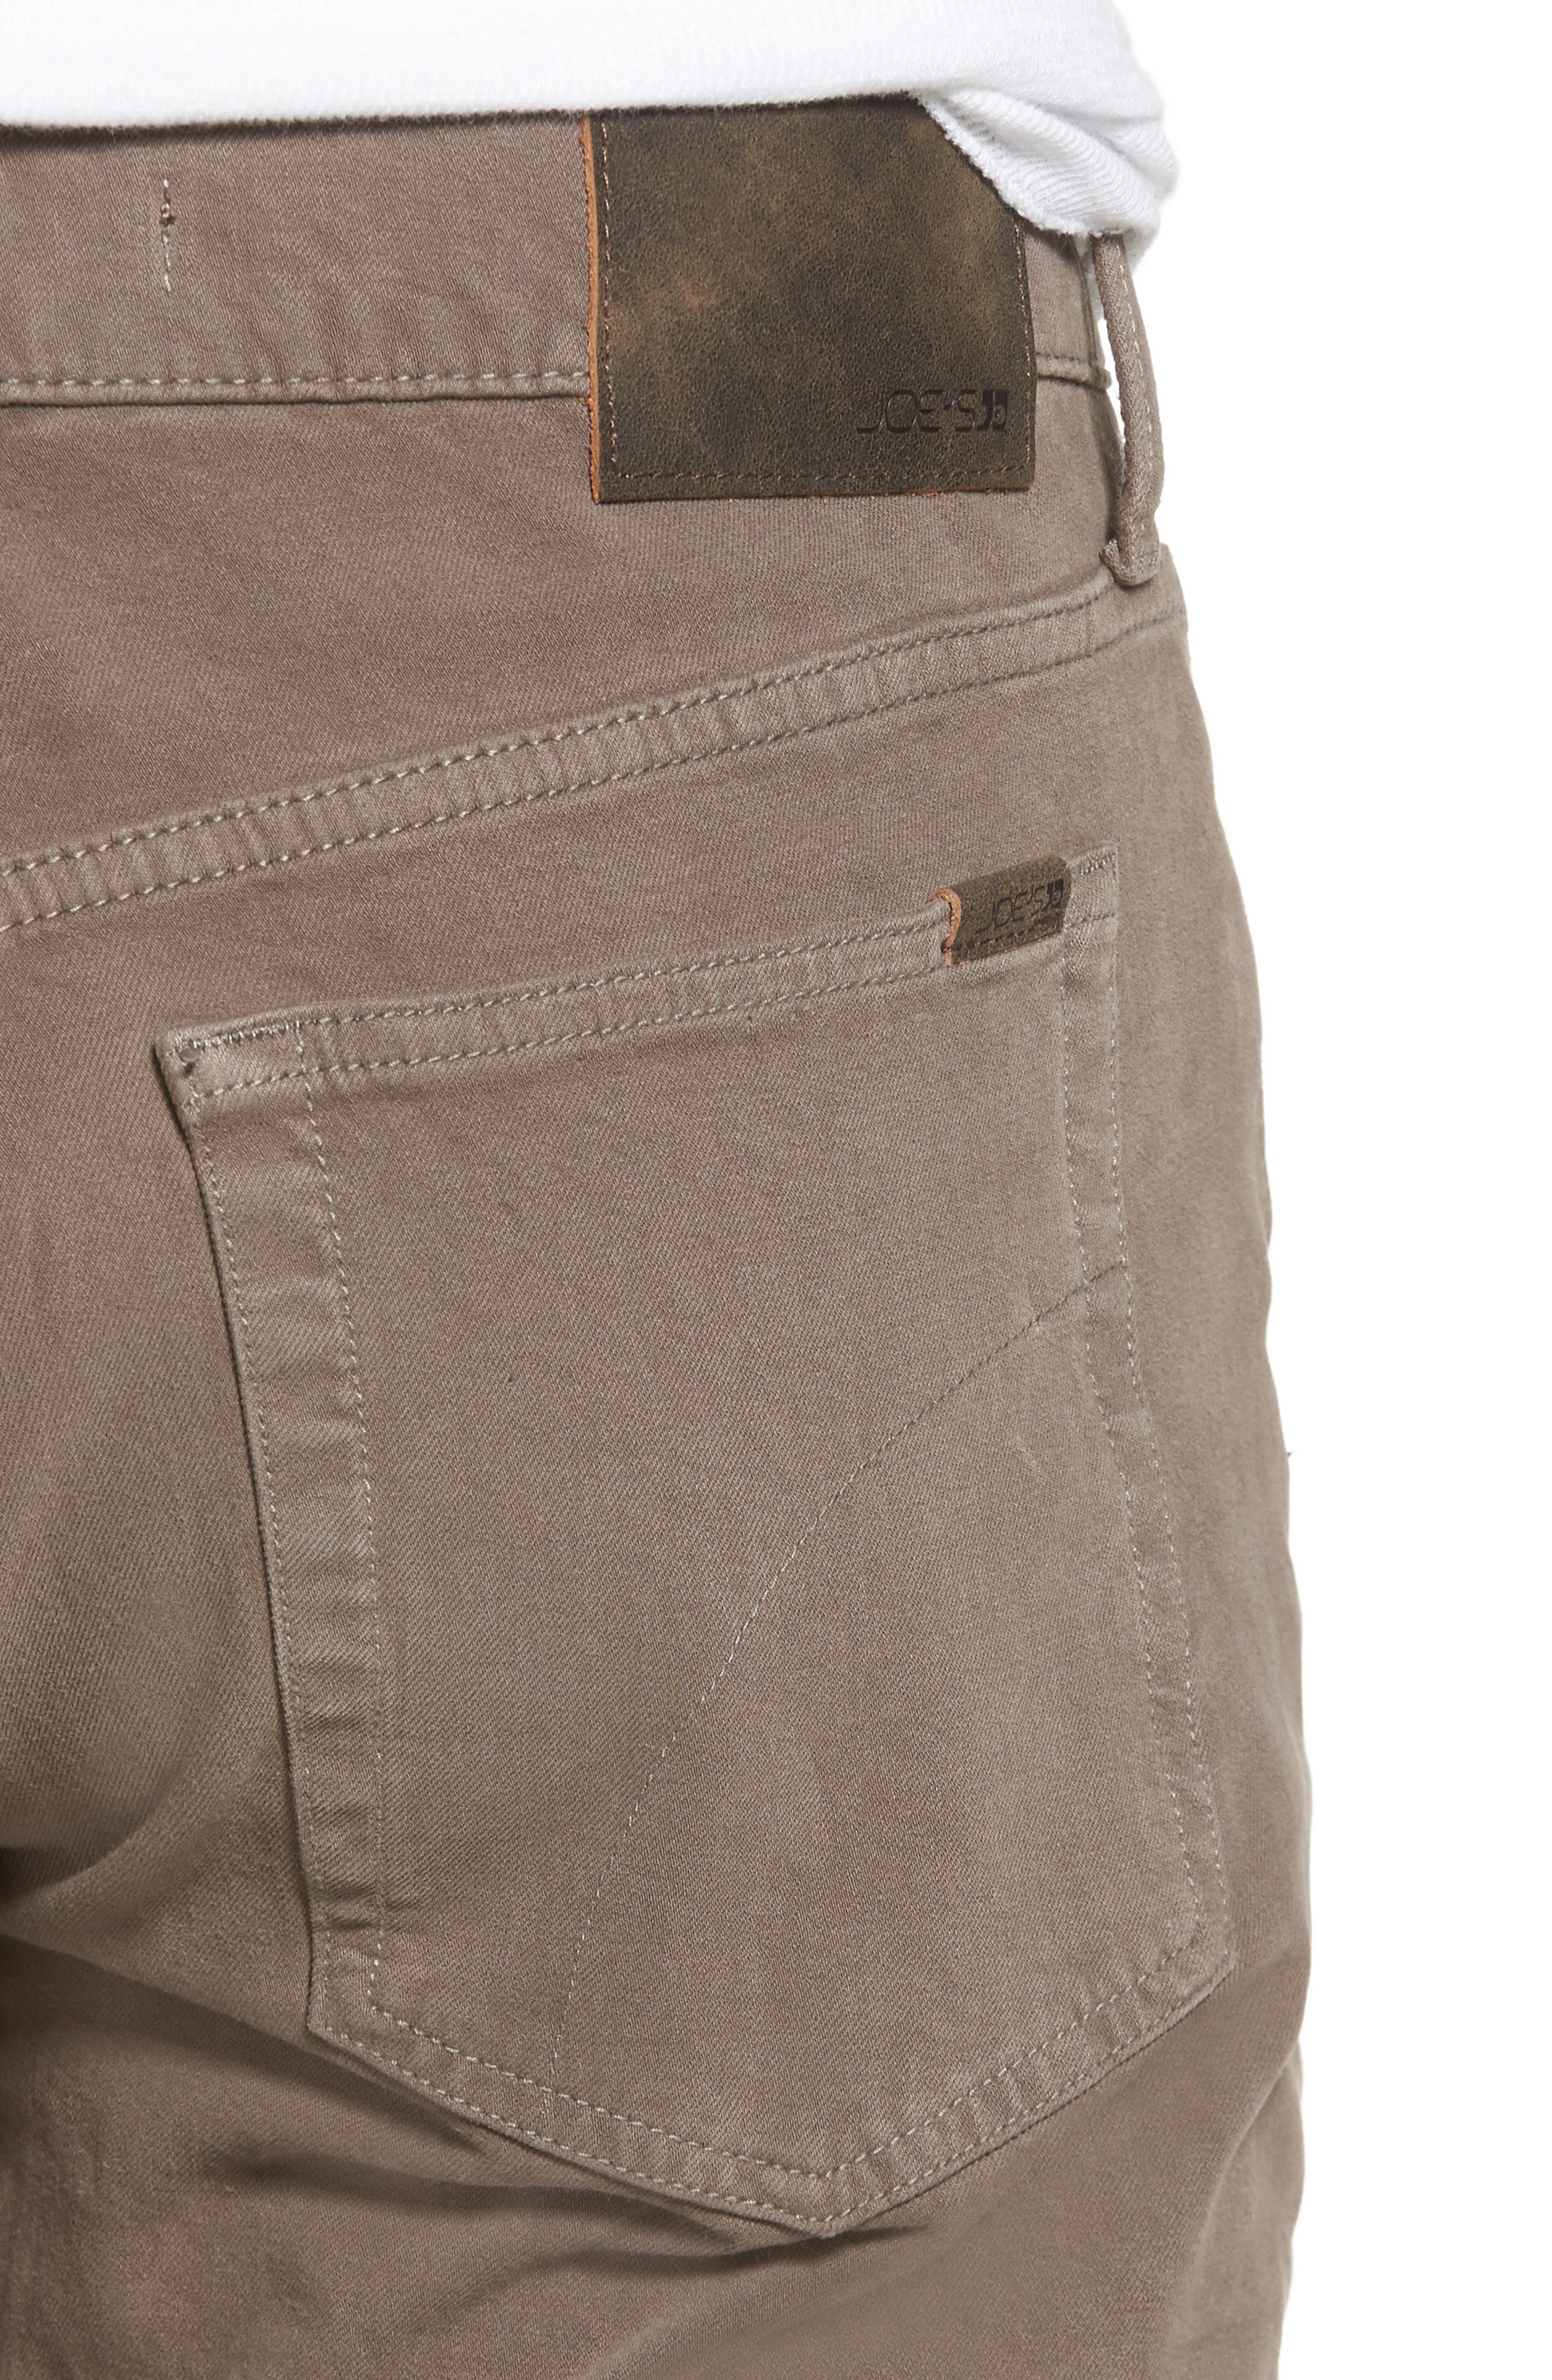 Kinetic Slim Fit Jeans,                             Alternate thumbnail 4, color,                             Stonehenge